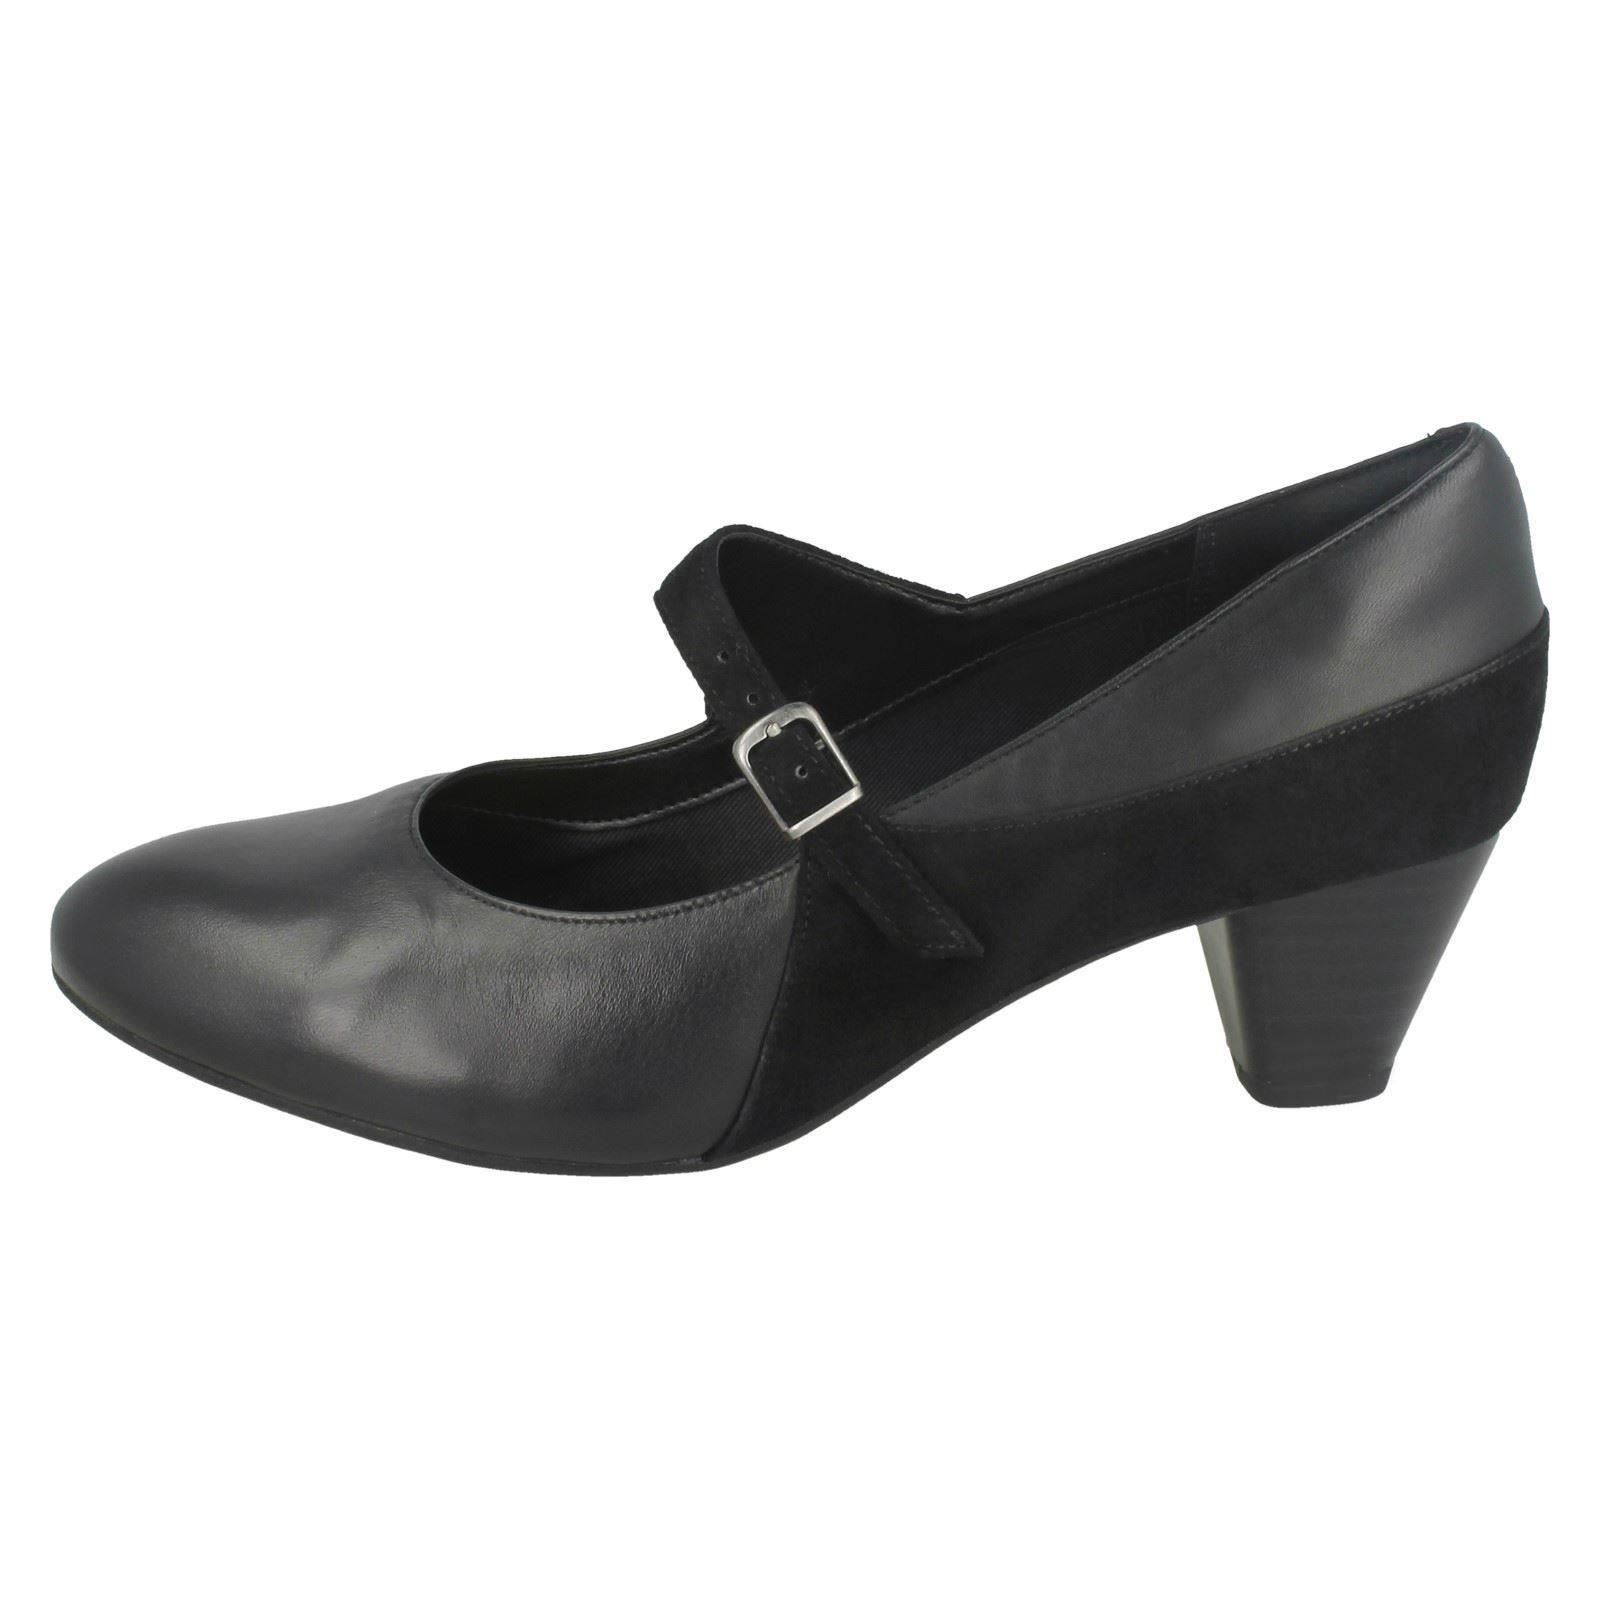 Descuento barato Ladies Clarks Smart Court Shoes Denny Bradford